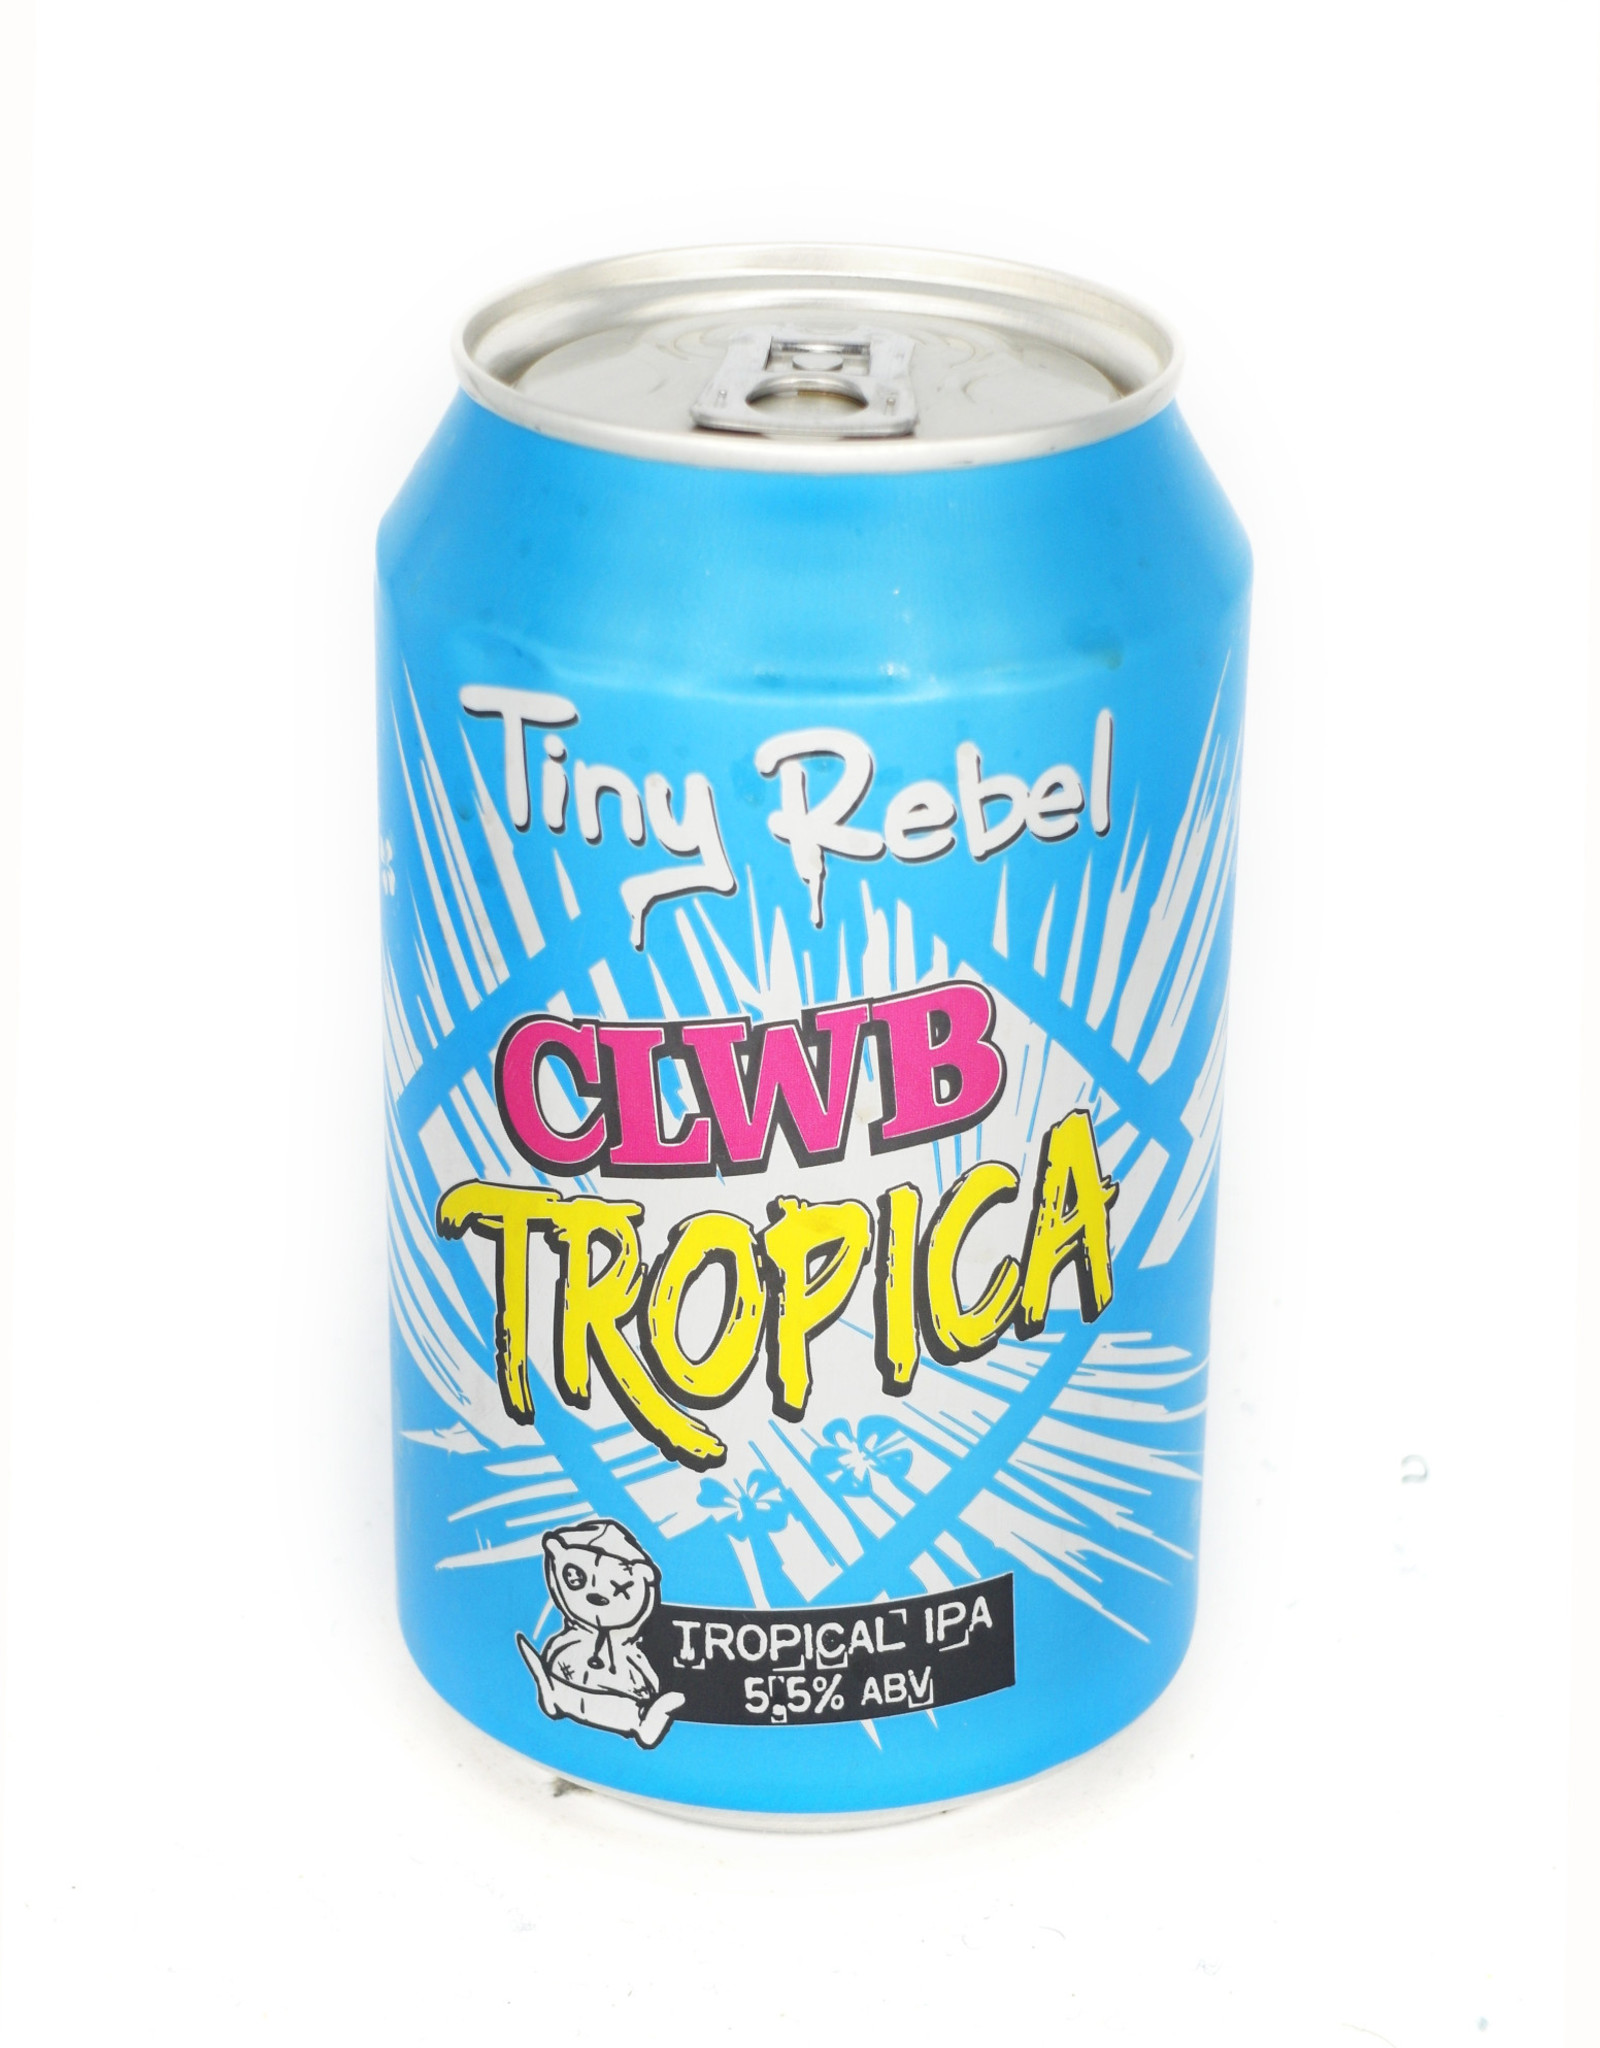 Tiny Rebel: CLWB Tropicana